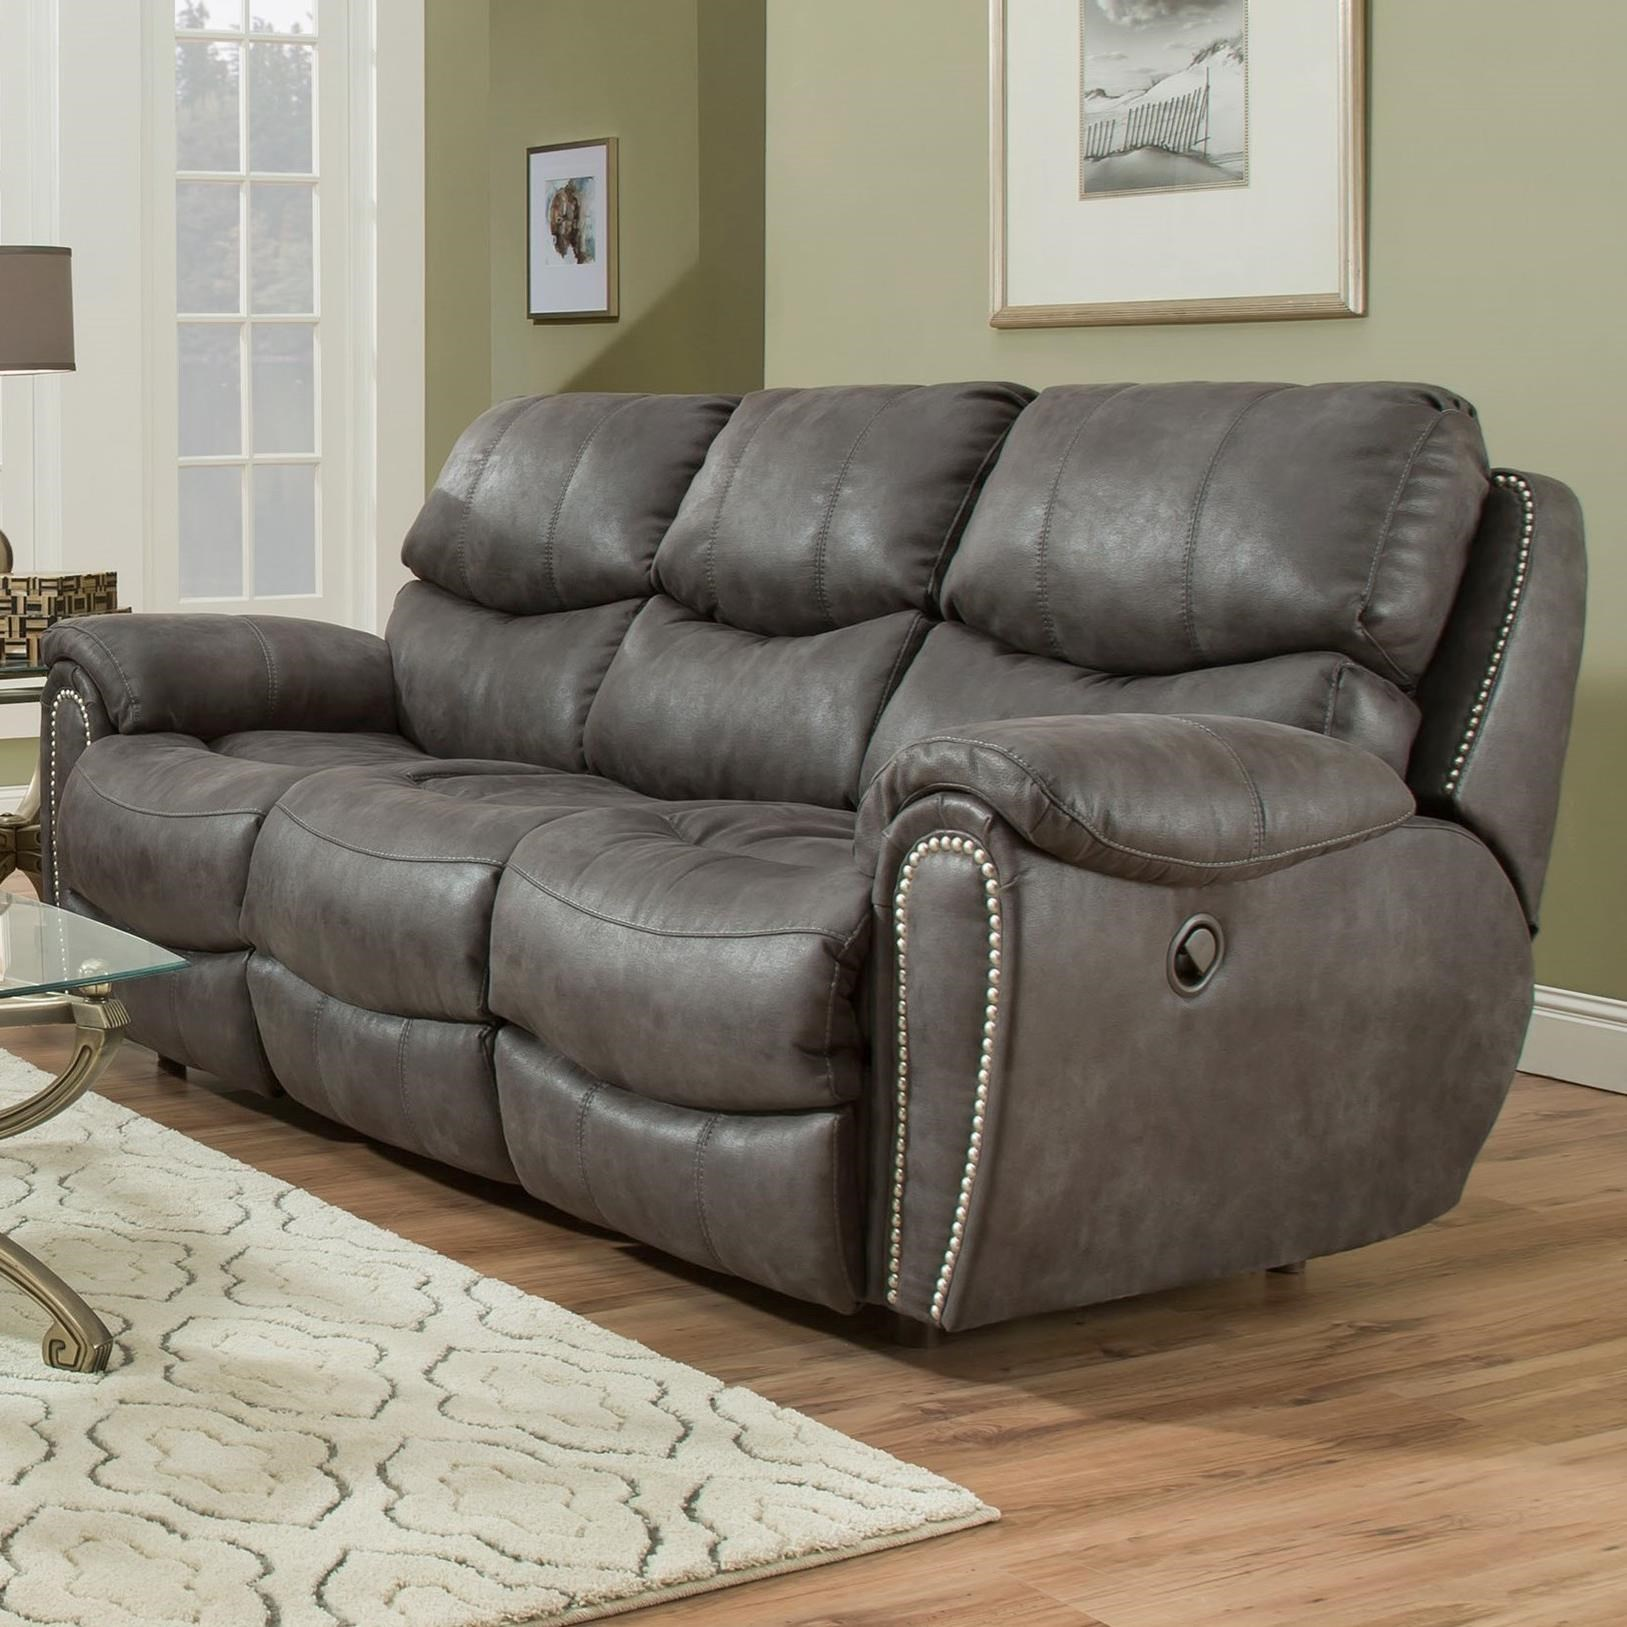 Franklin RichmondReclining Sofa With Nailhead Trim